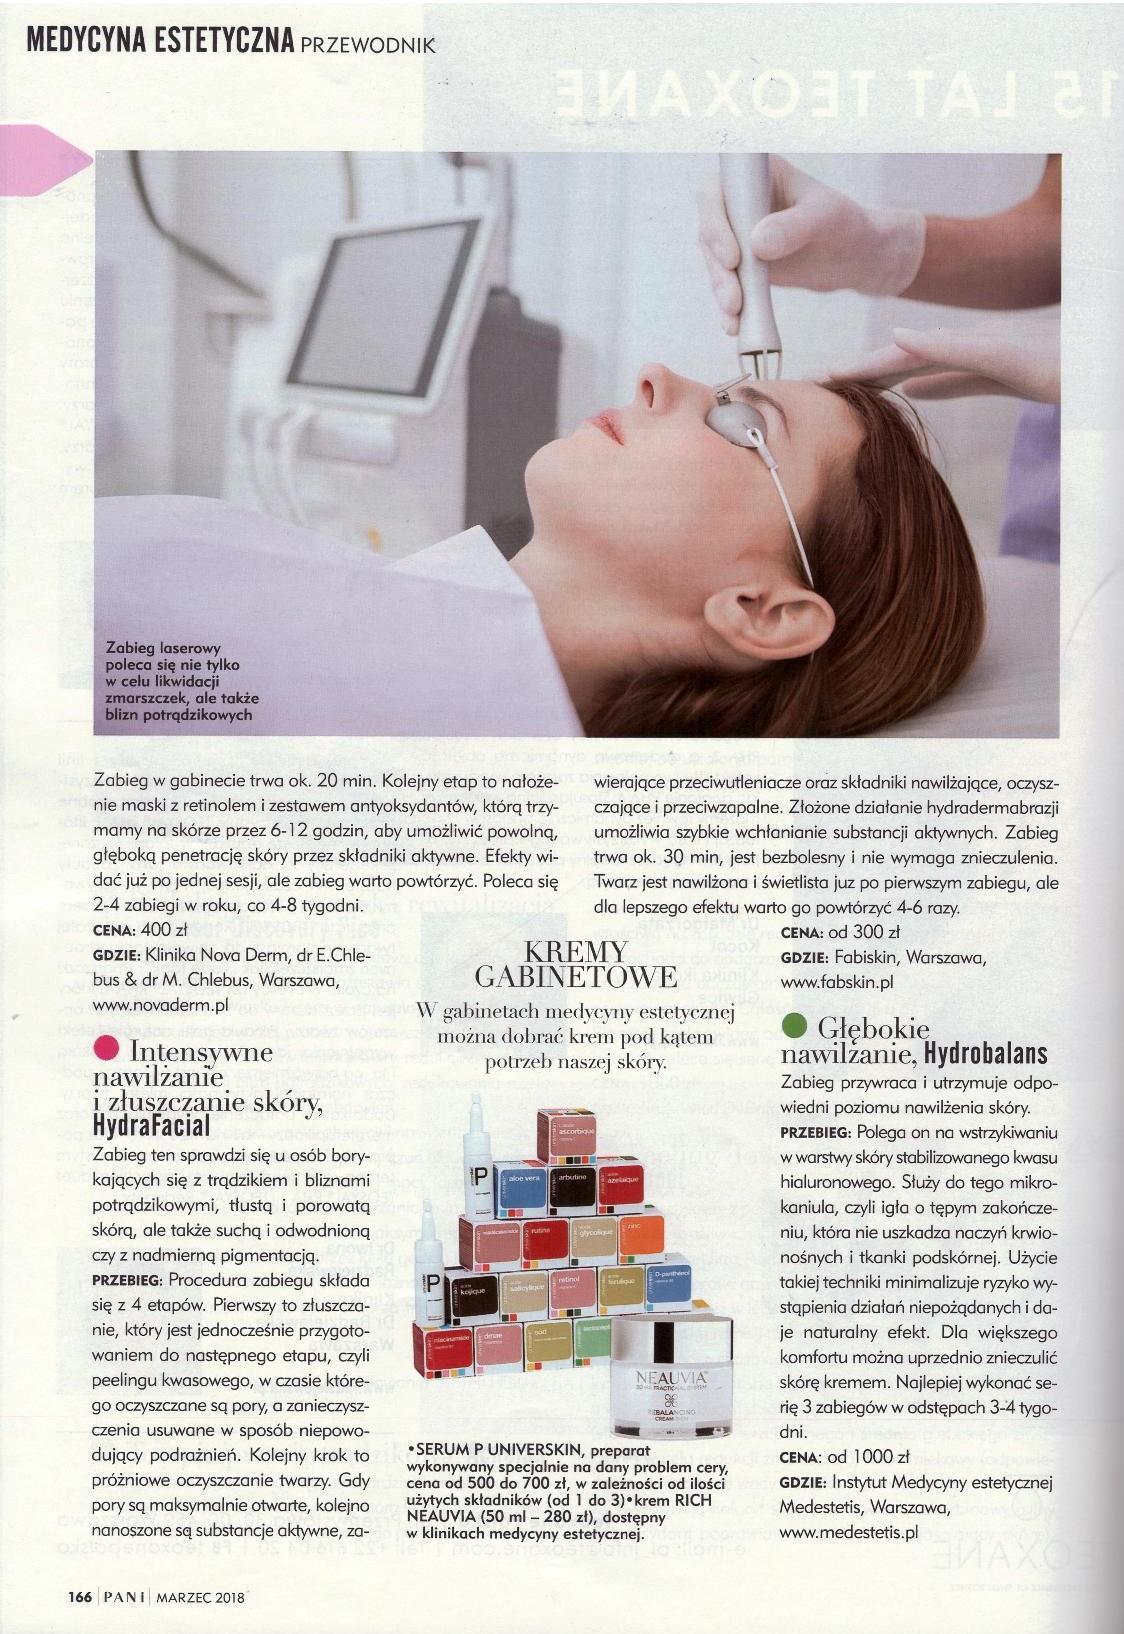 pani_marzec2018-page-003